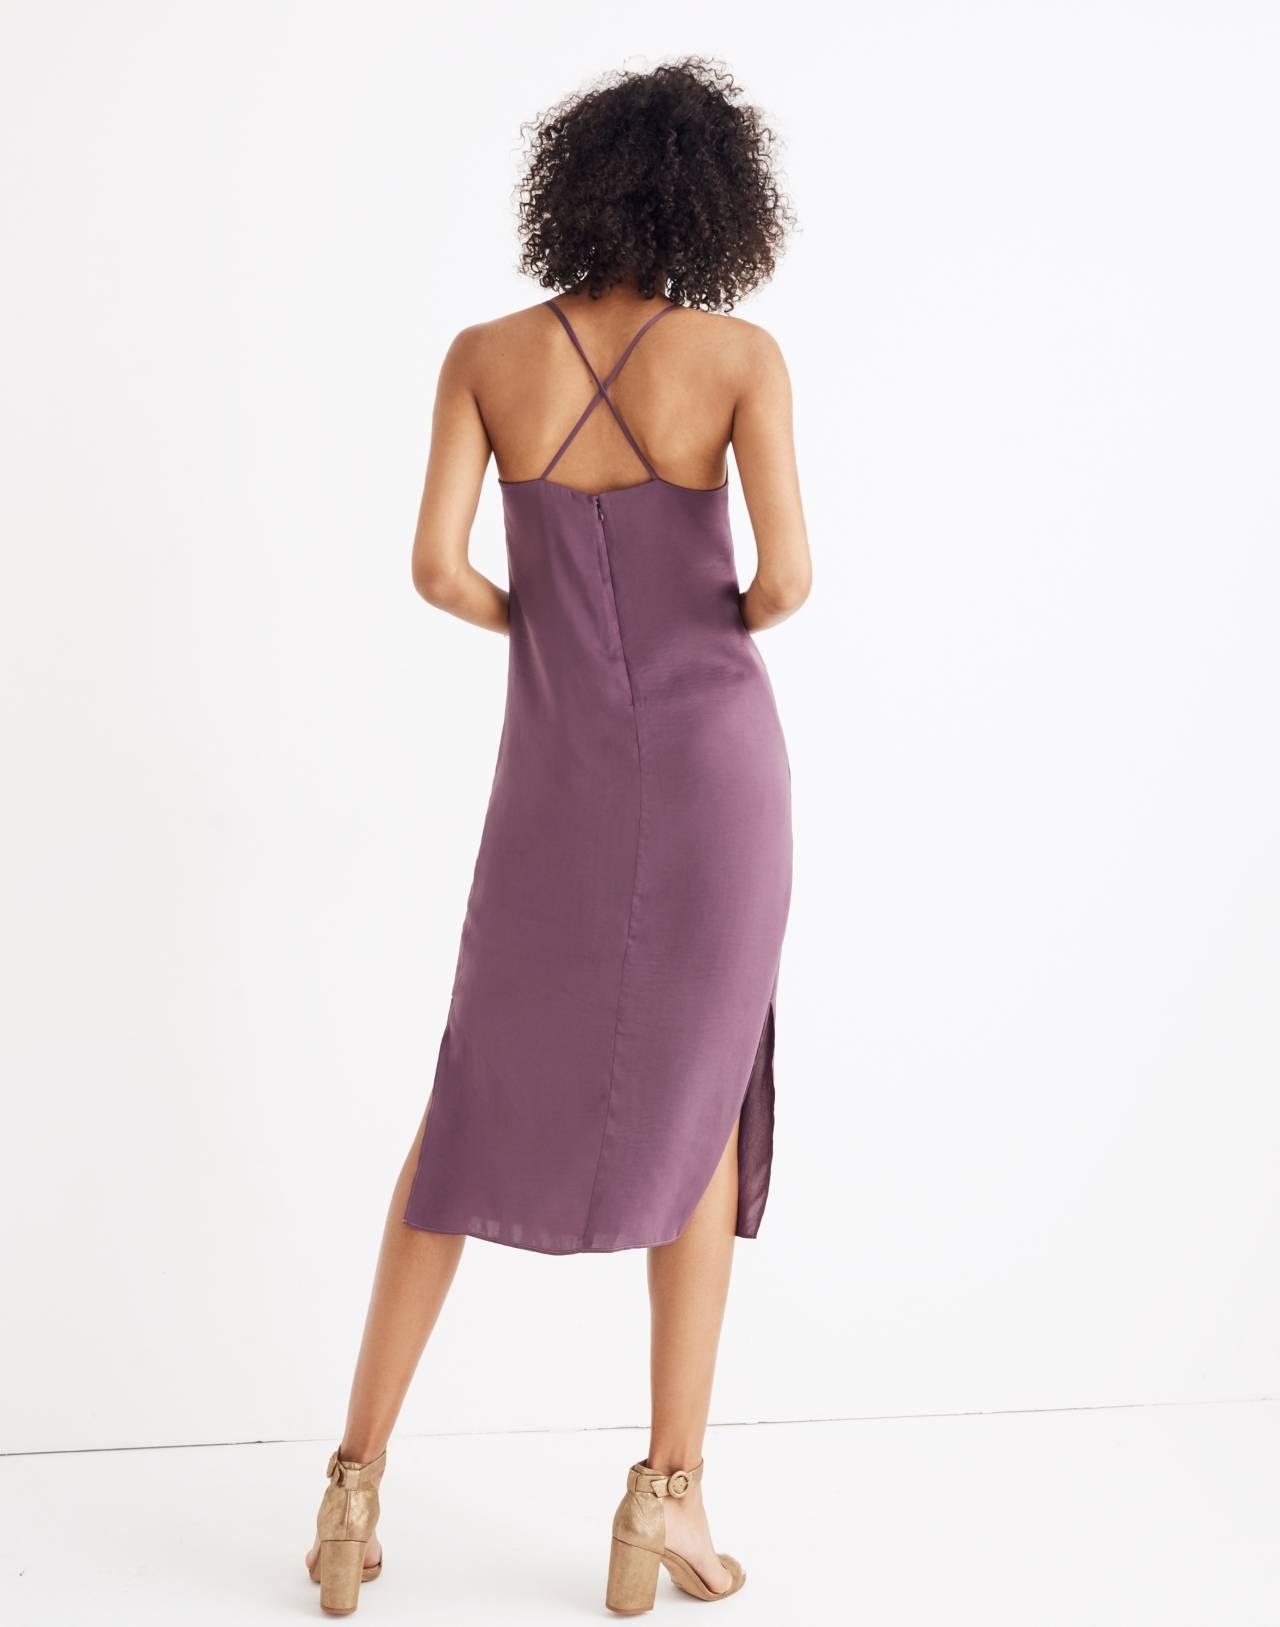 Apron Slip Dress in faded eggplant image 3